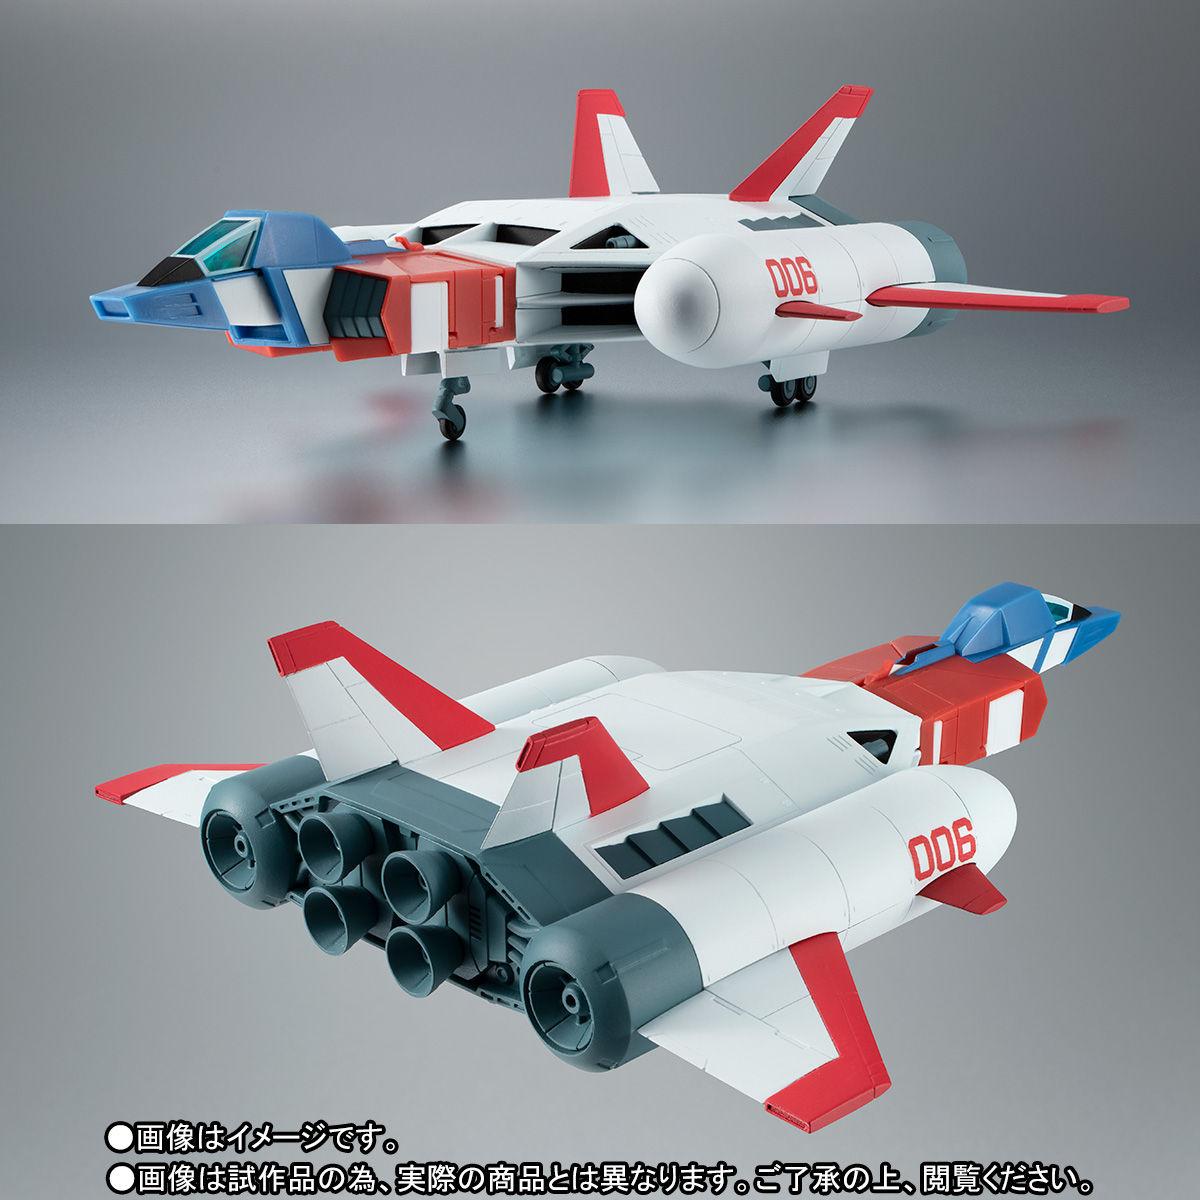 ROBOT魂〈SIDE MS〉『FF-X7-Bst コア・ブースター 2機セット ver. A.N.I.M.E. ~スレッガー005 & セイラ006~』機動戦士ガンダム 可動フィギュア-008